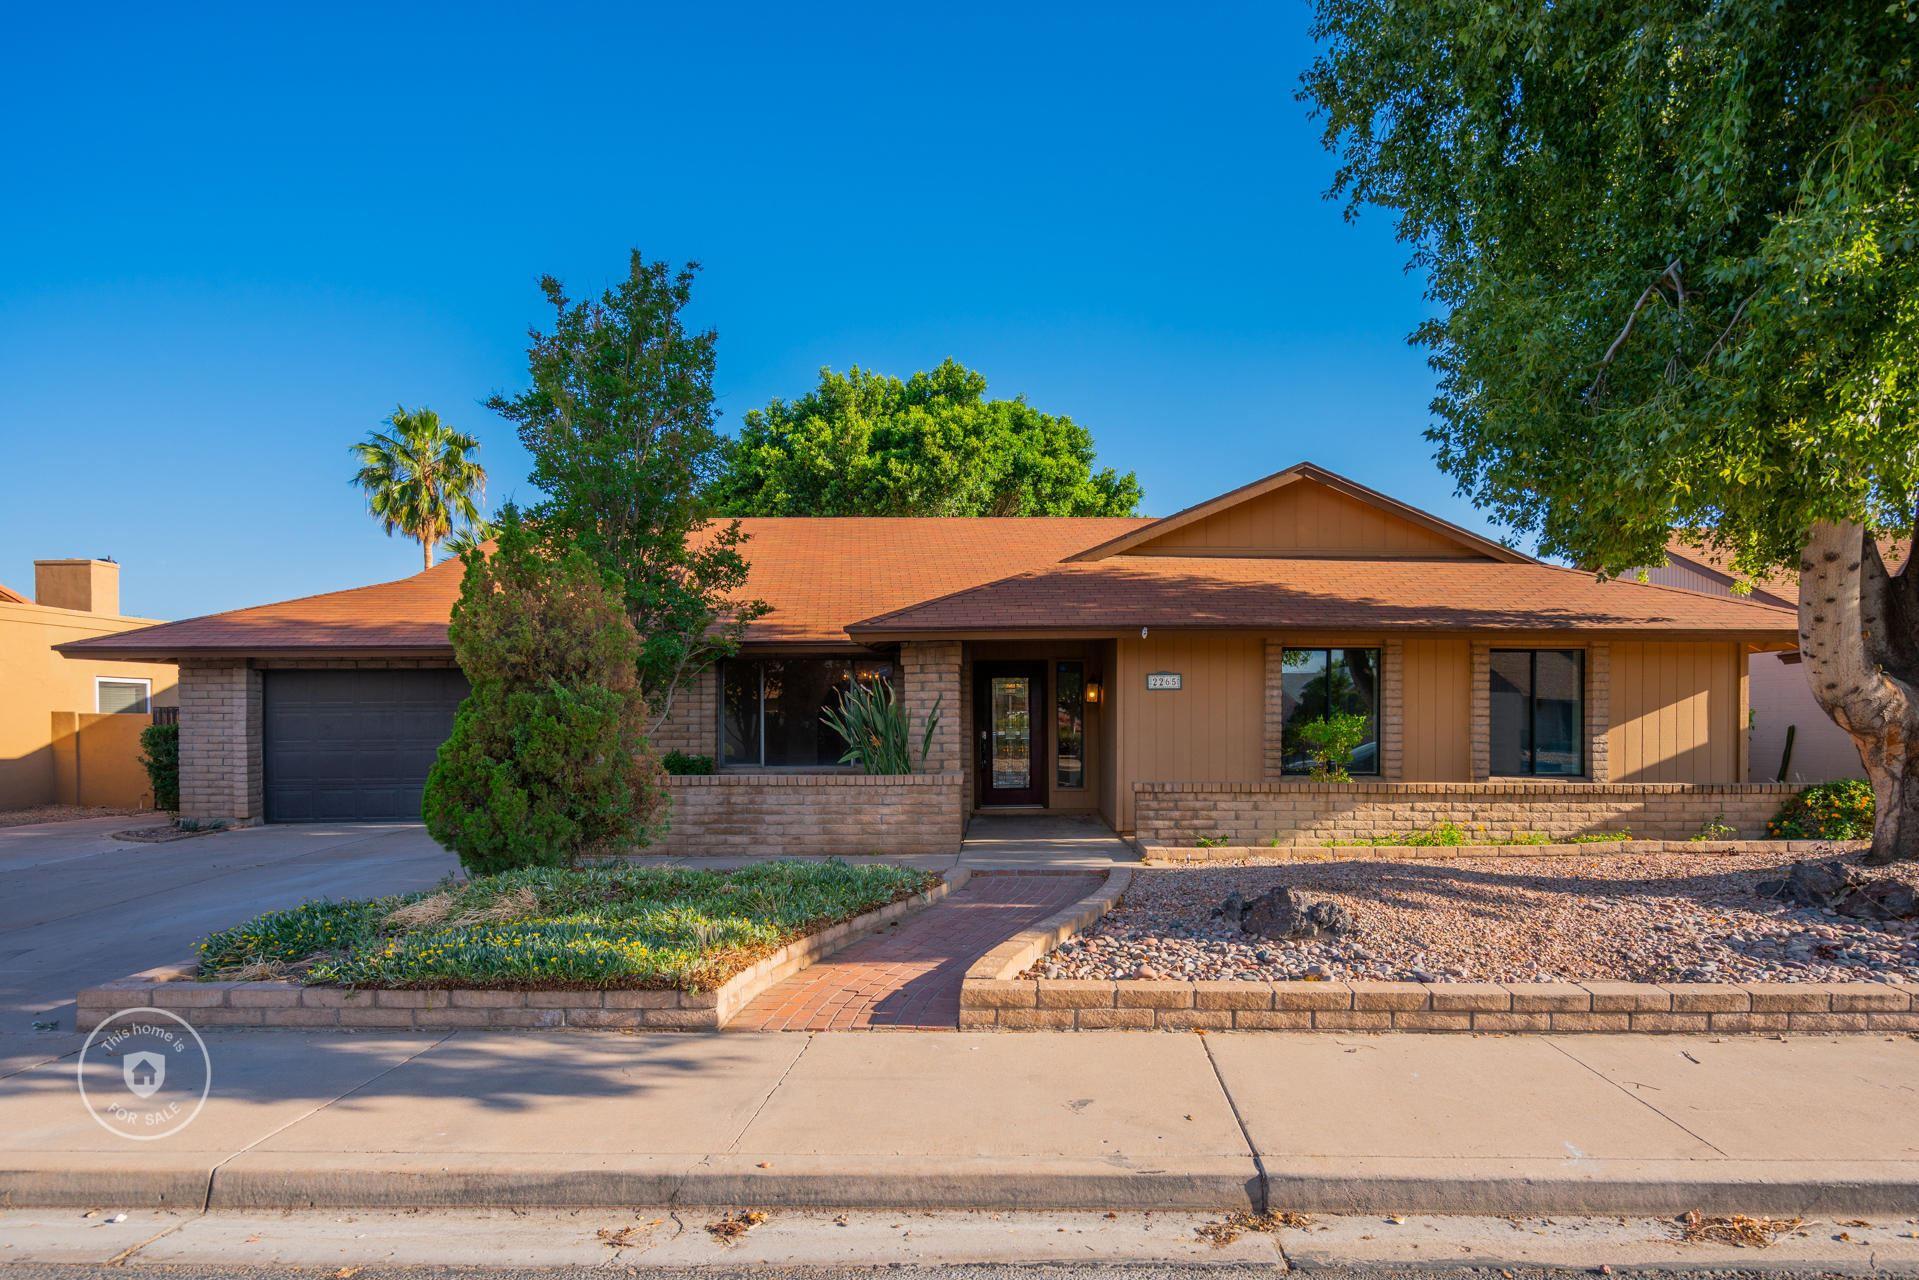 Photo of 2265 W KEATING Avenue, Mesa, AZ 85202 (MLS # 6232614)